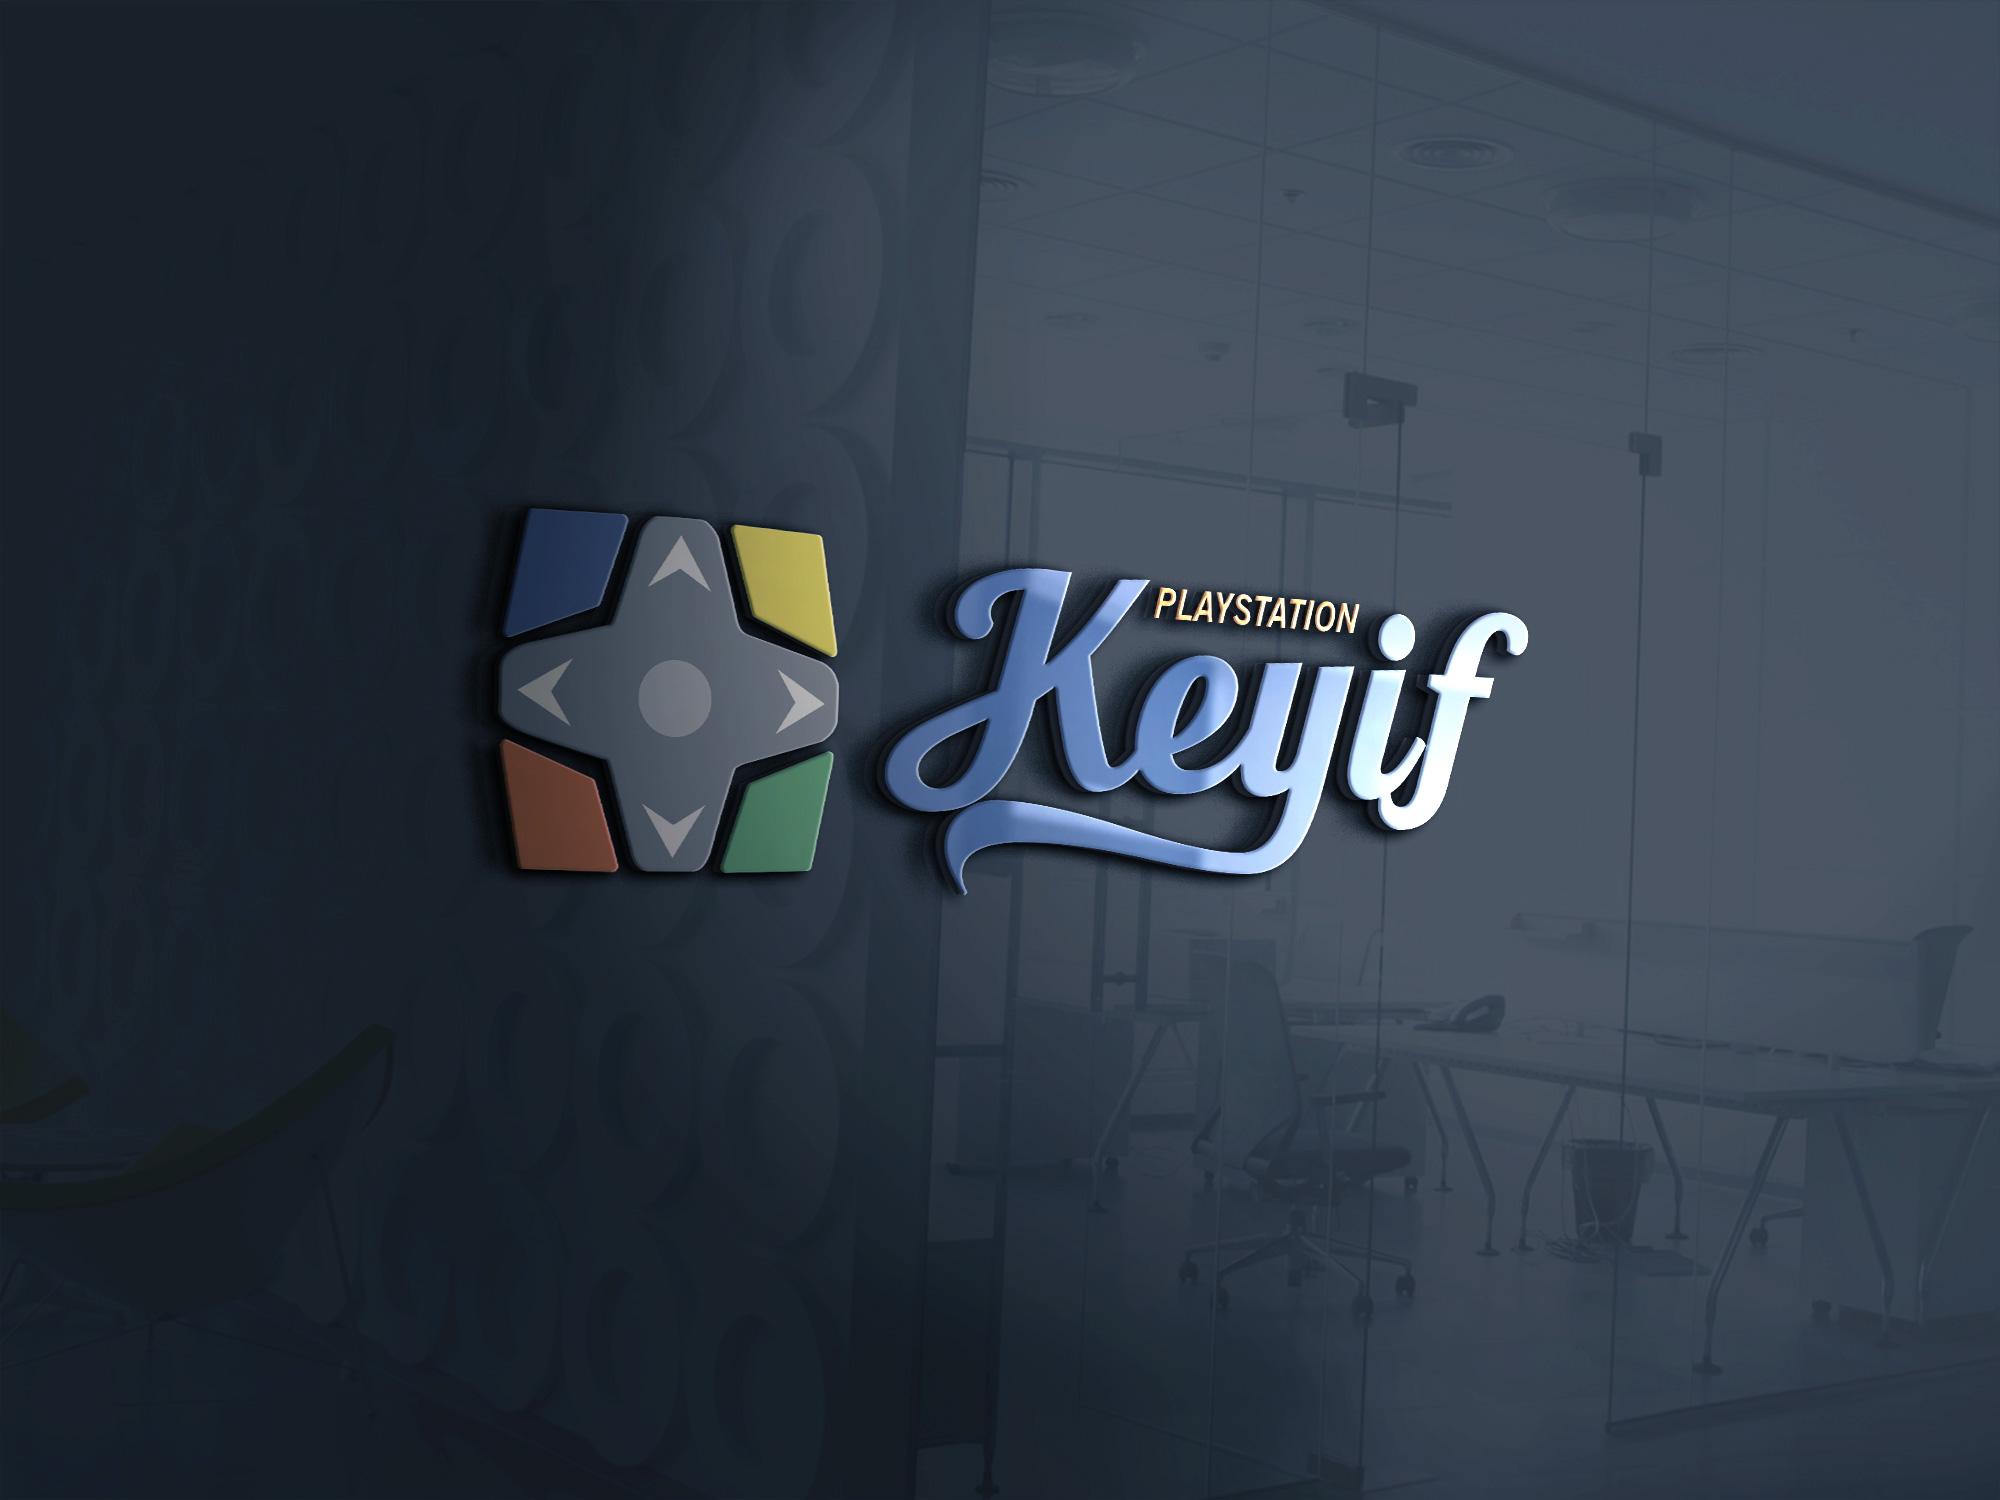 keyif playtation logo 1 mockup 2 - Neler Yaptık?